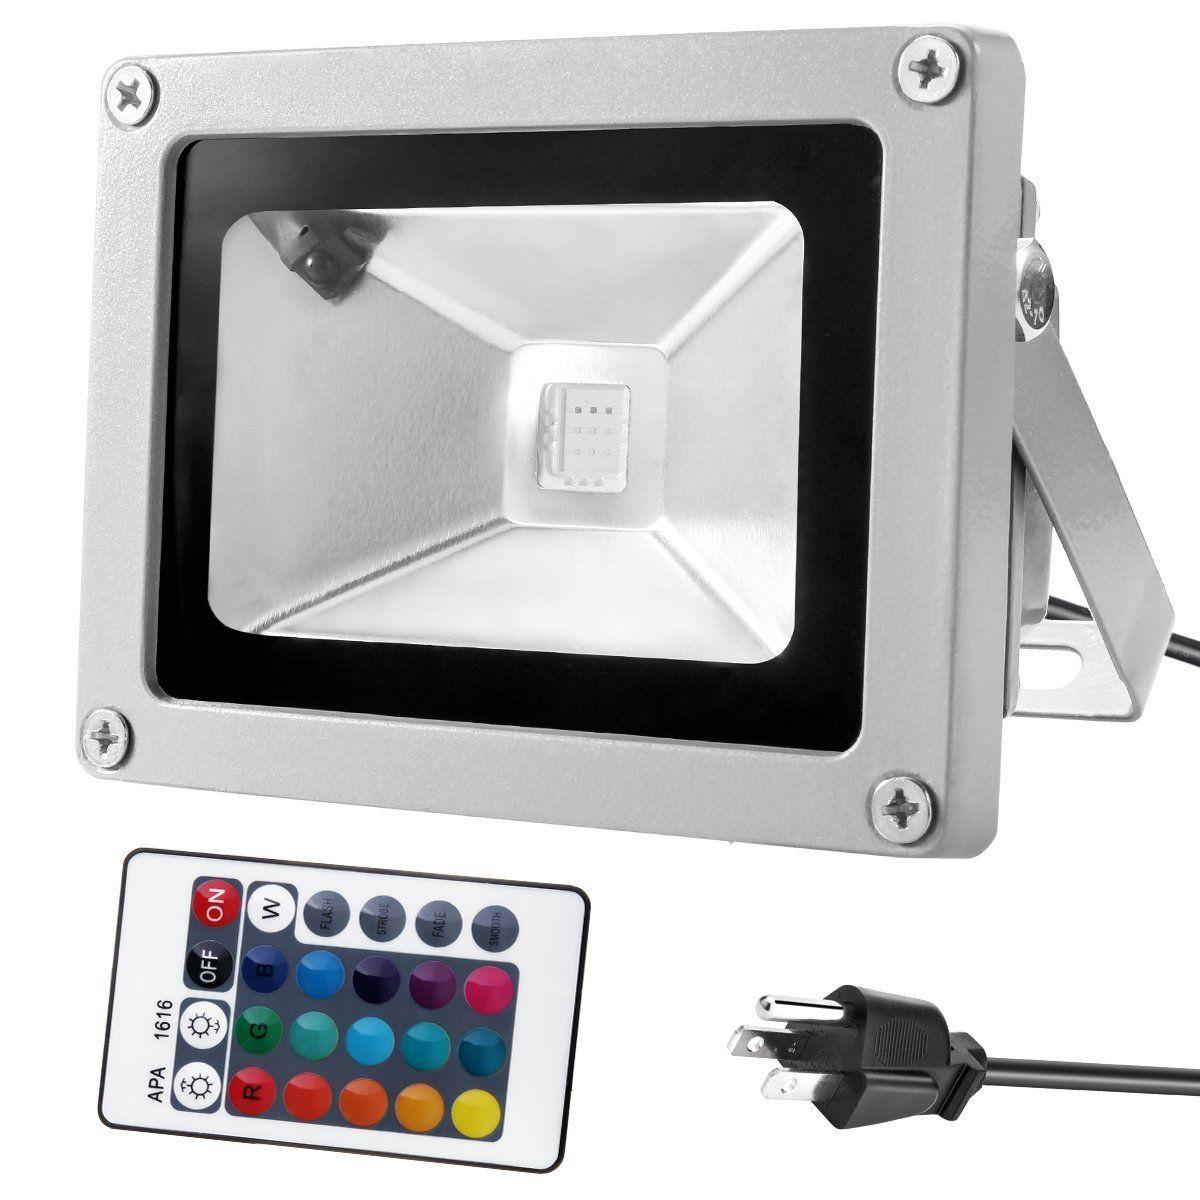 10W Impermeable LED Luz de inundación 24Key IR Control remoto RGB Led Lámpara de paisaje al aire libre Proyector Luz proyectores 85-260V